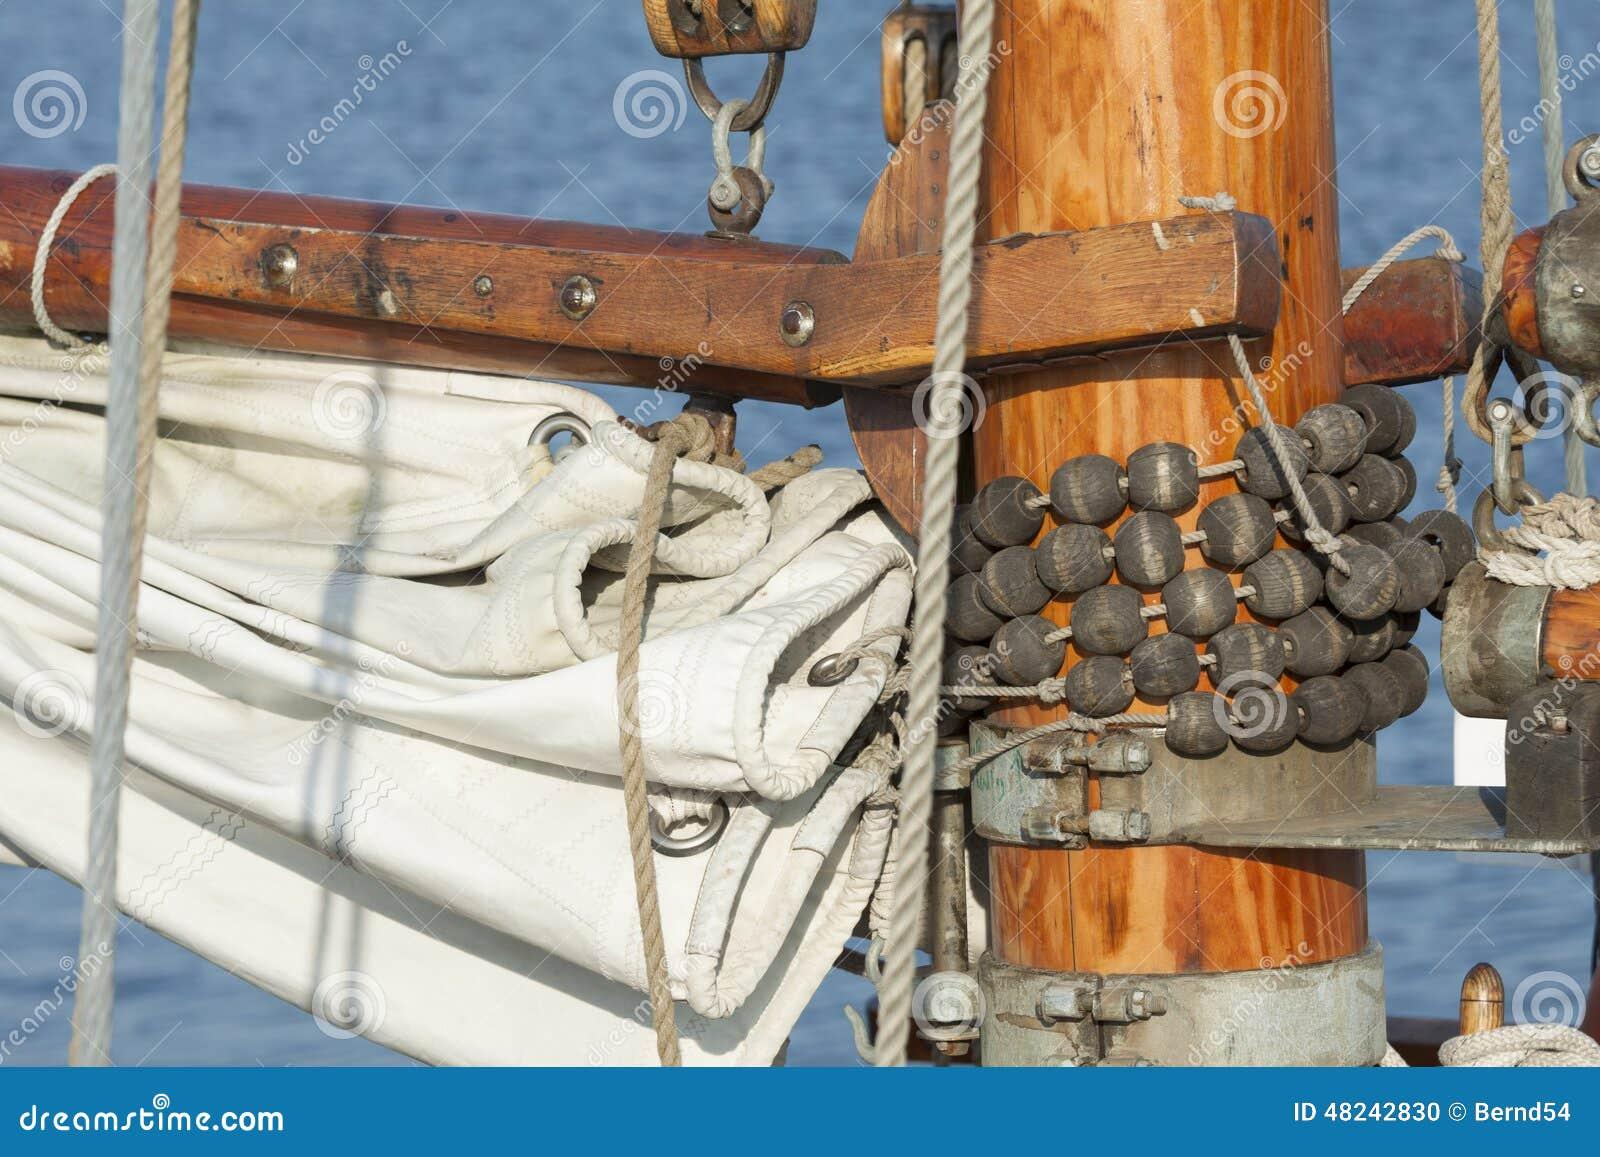 Mast slider stock photo  Image of gooseneck, water, gaff - 48242830